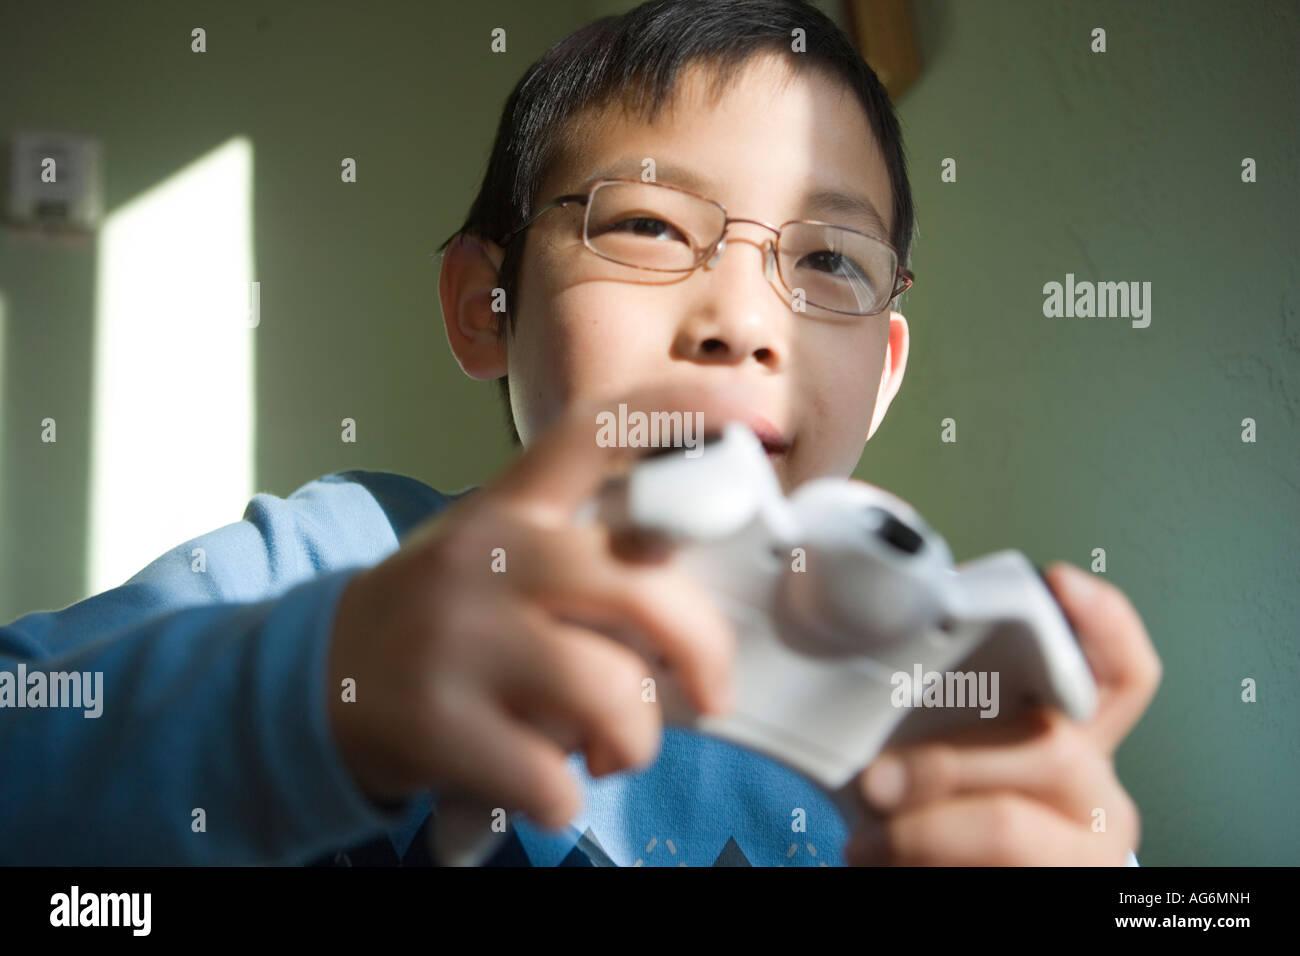 japanische zehnjähriger Junge spielen Videospiel closeup Stockbild